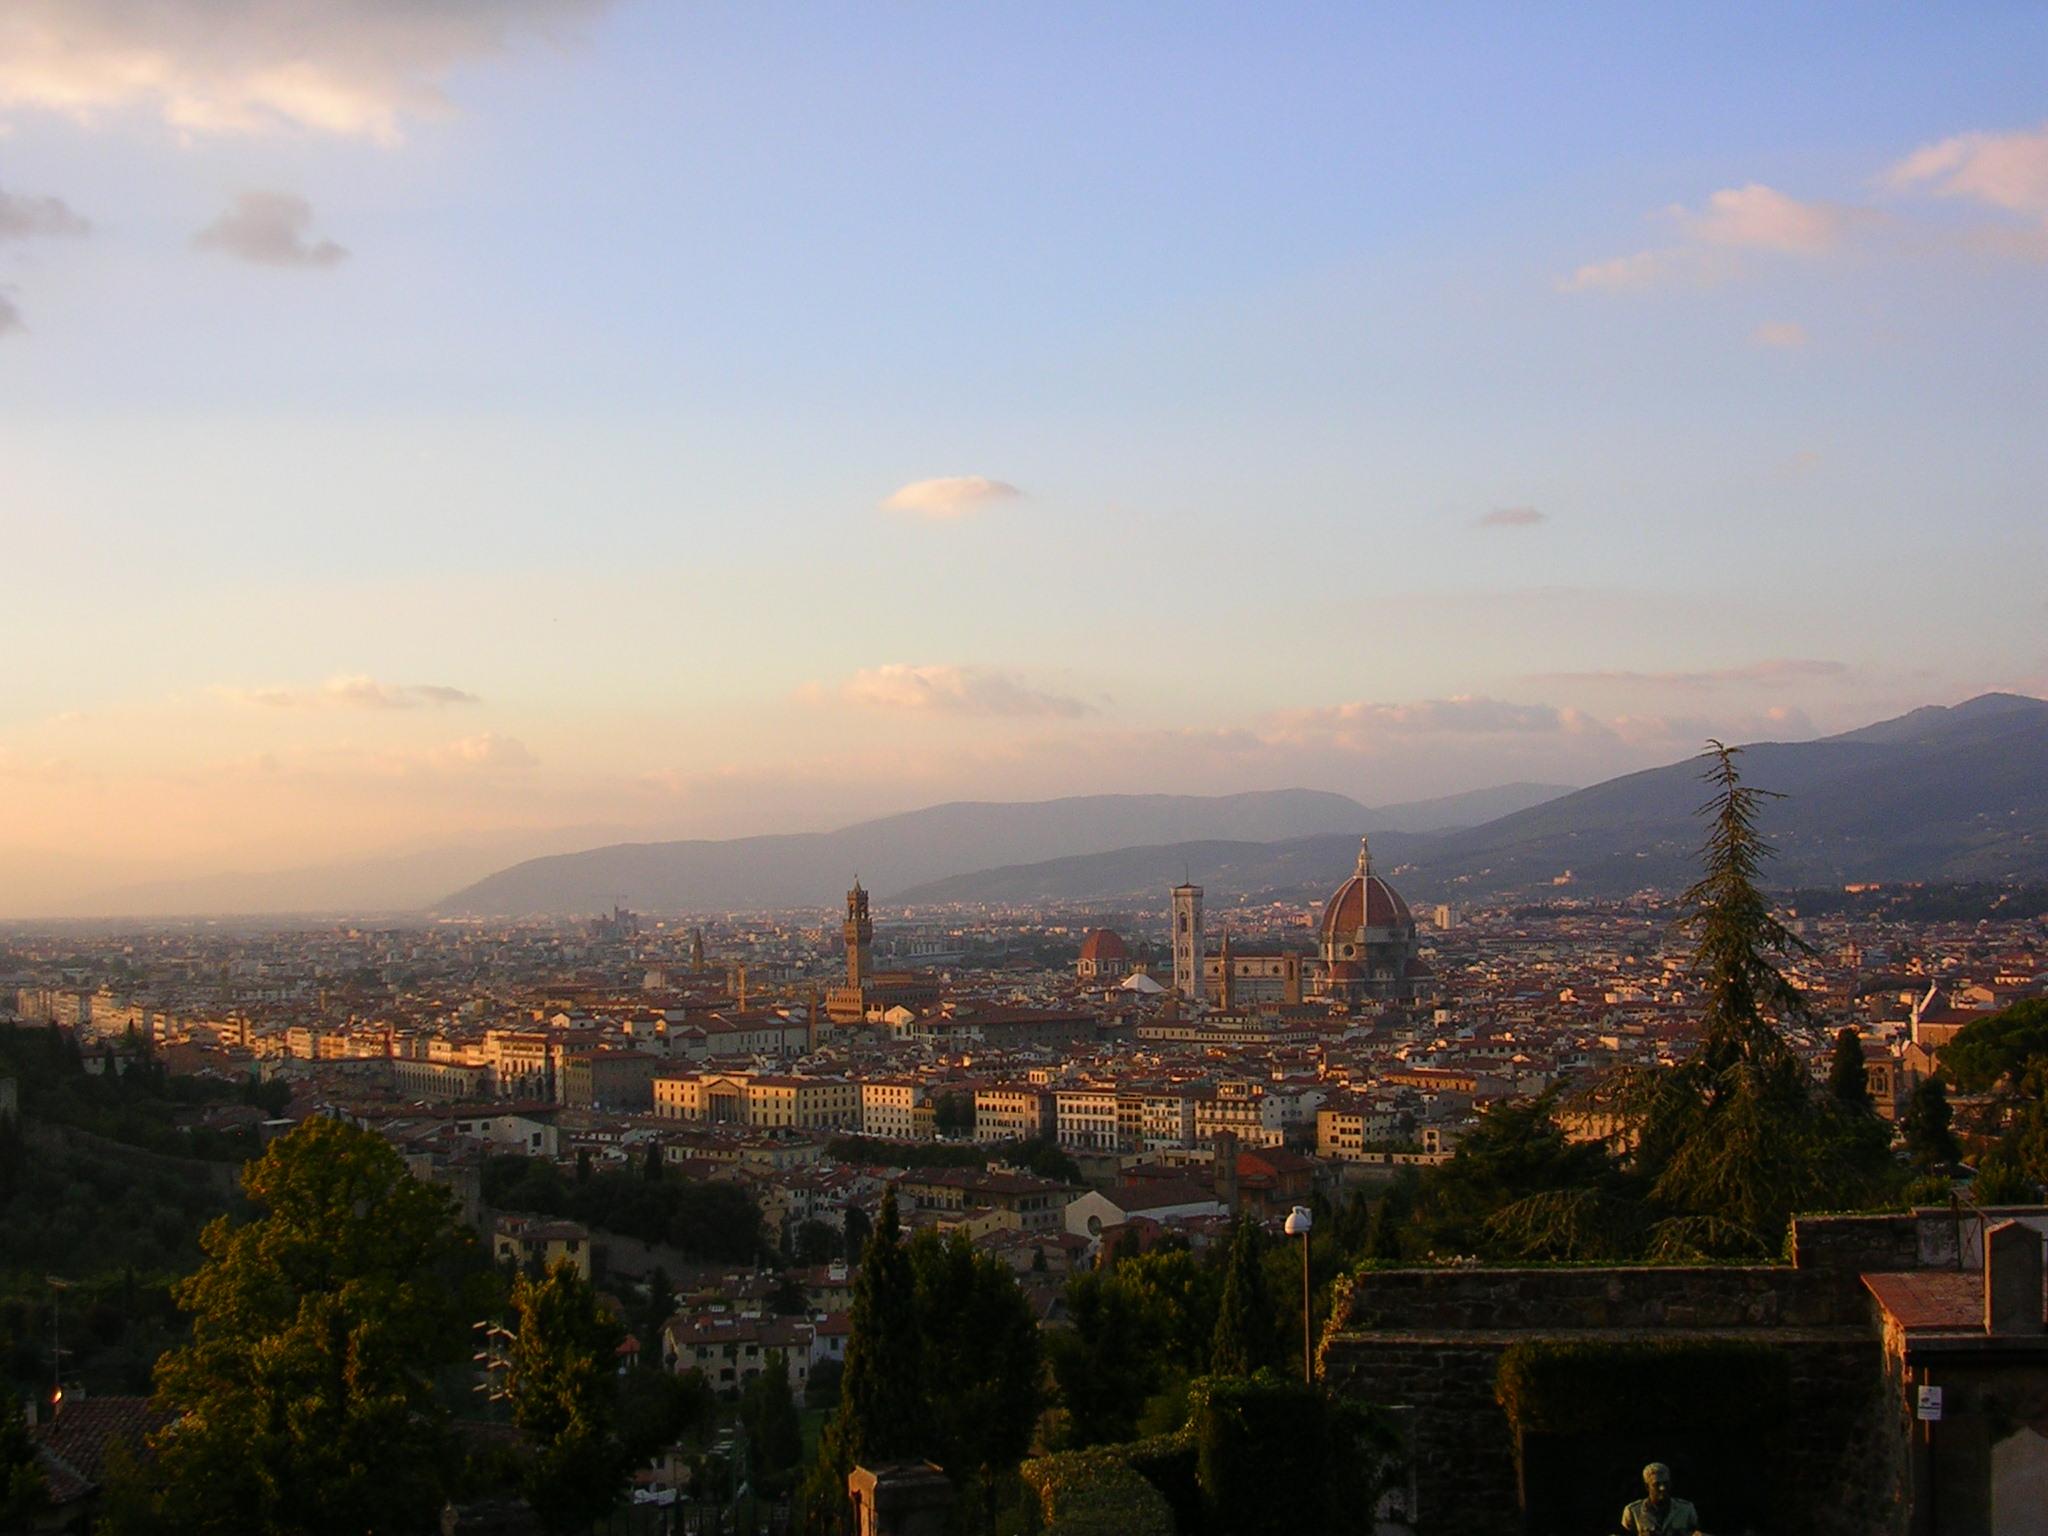 Florence | EAT.PRAY.MOVE Yoga | Chianti, Italy